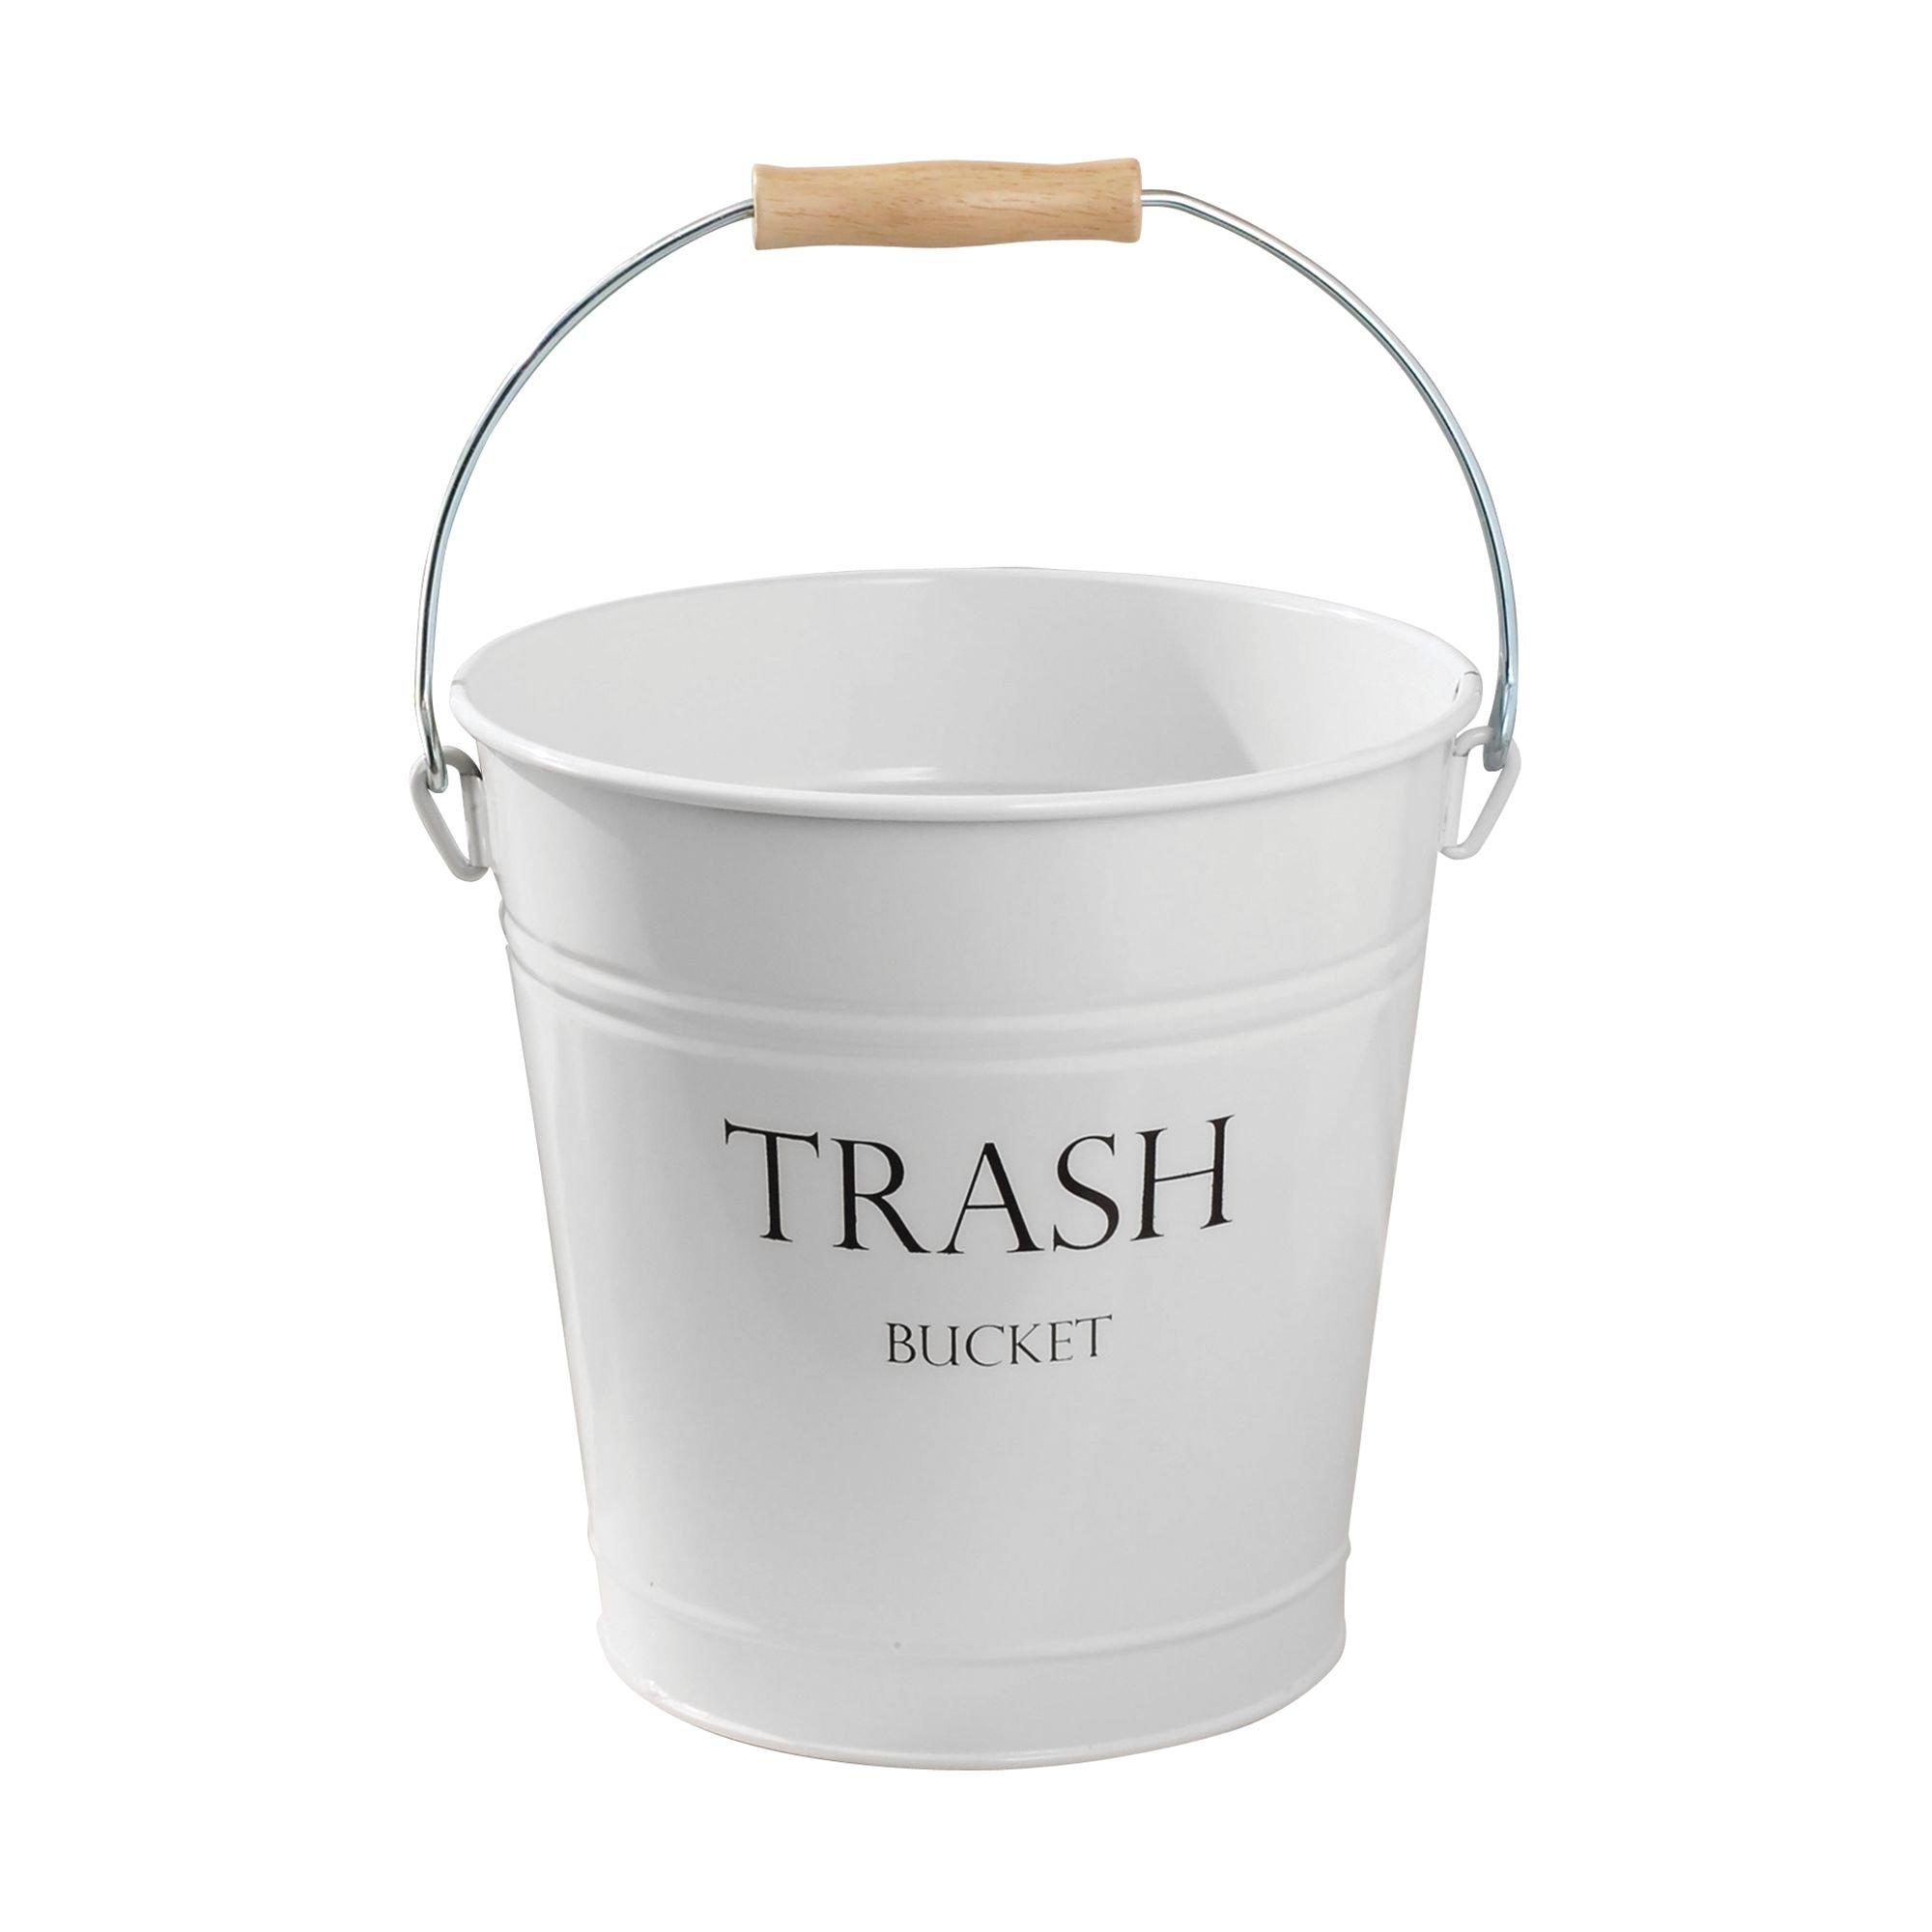 InterDesign Pail Wastebasket Trash Can - Pack of 6, White